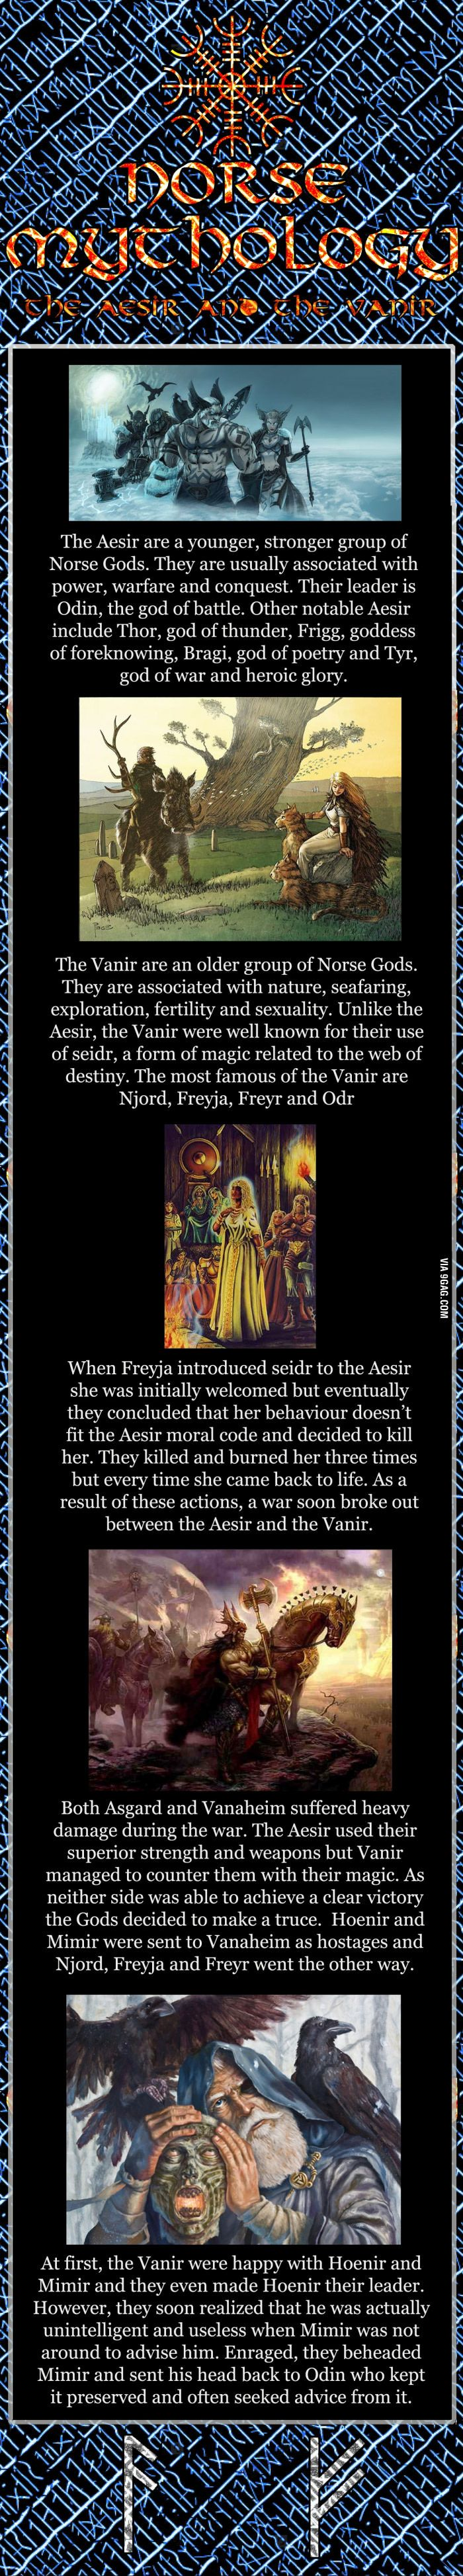 Norse mythology series - The Aesir and the Vanir